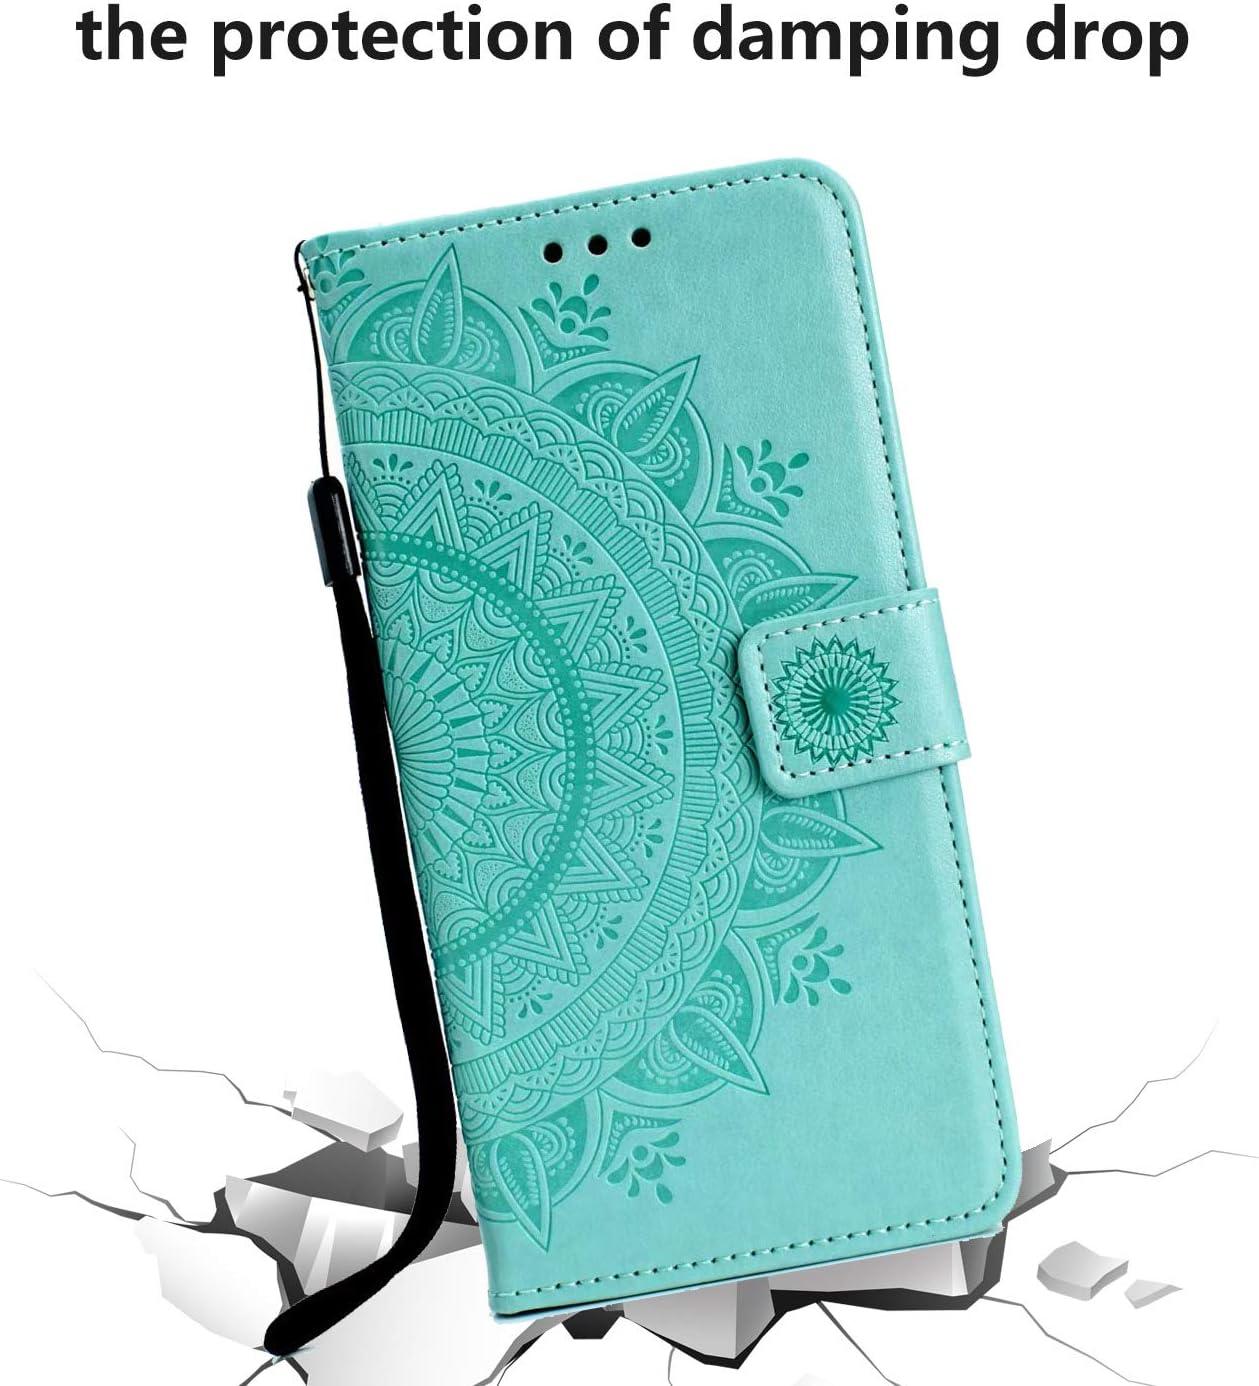 Handyh/ülle Samsung Galaxy A51 Case Tasche Leder Flip Mandala Wallet Schutzh/ülle St/änder Klapph/ülle Schale Bumper Magnet Deckel f/ür Galaxy A51 Grau Handytasche f/ür Samsung Galaxy A51 H/ülle